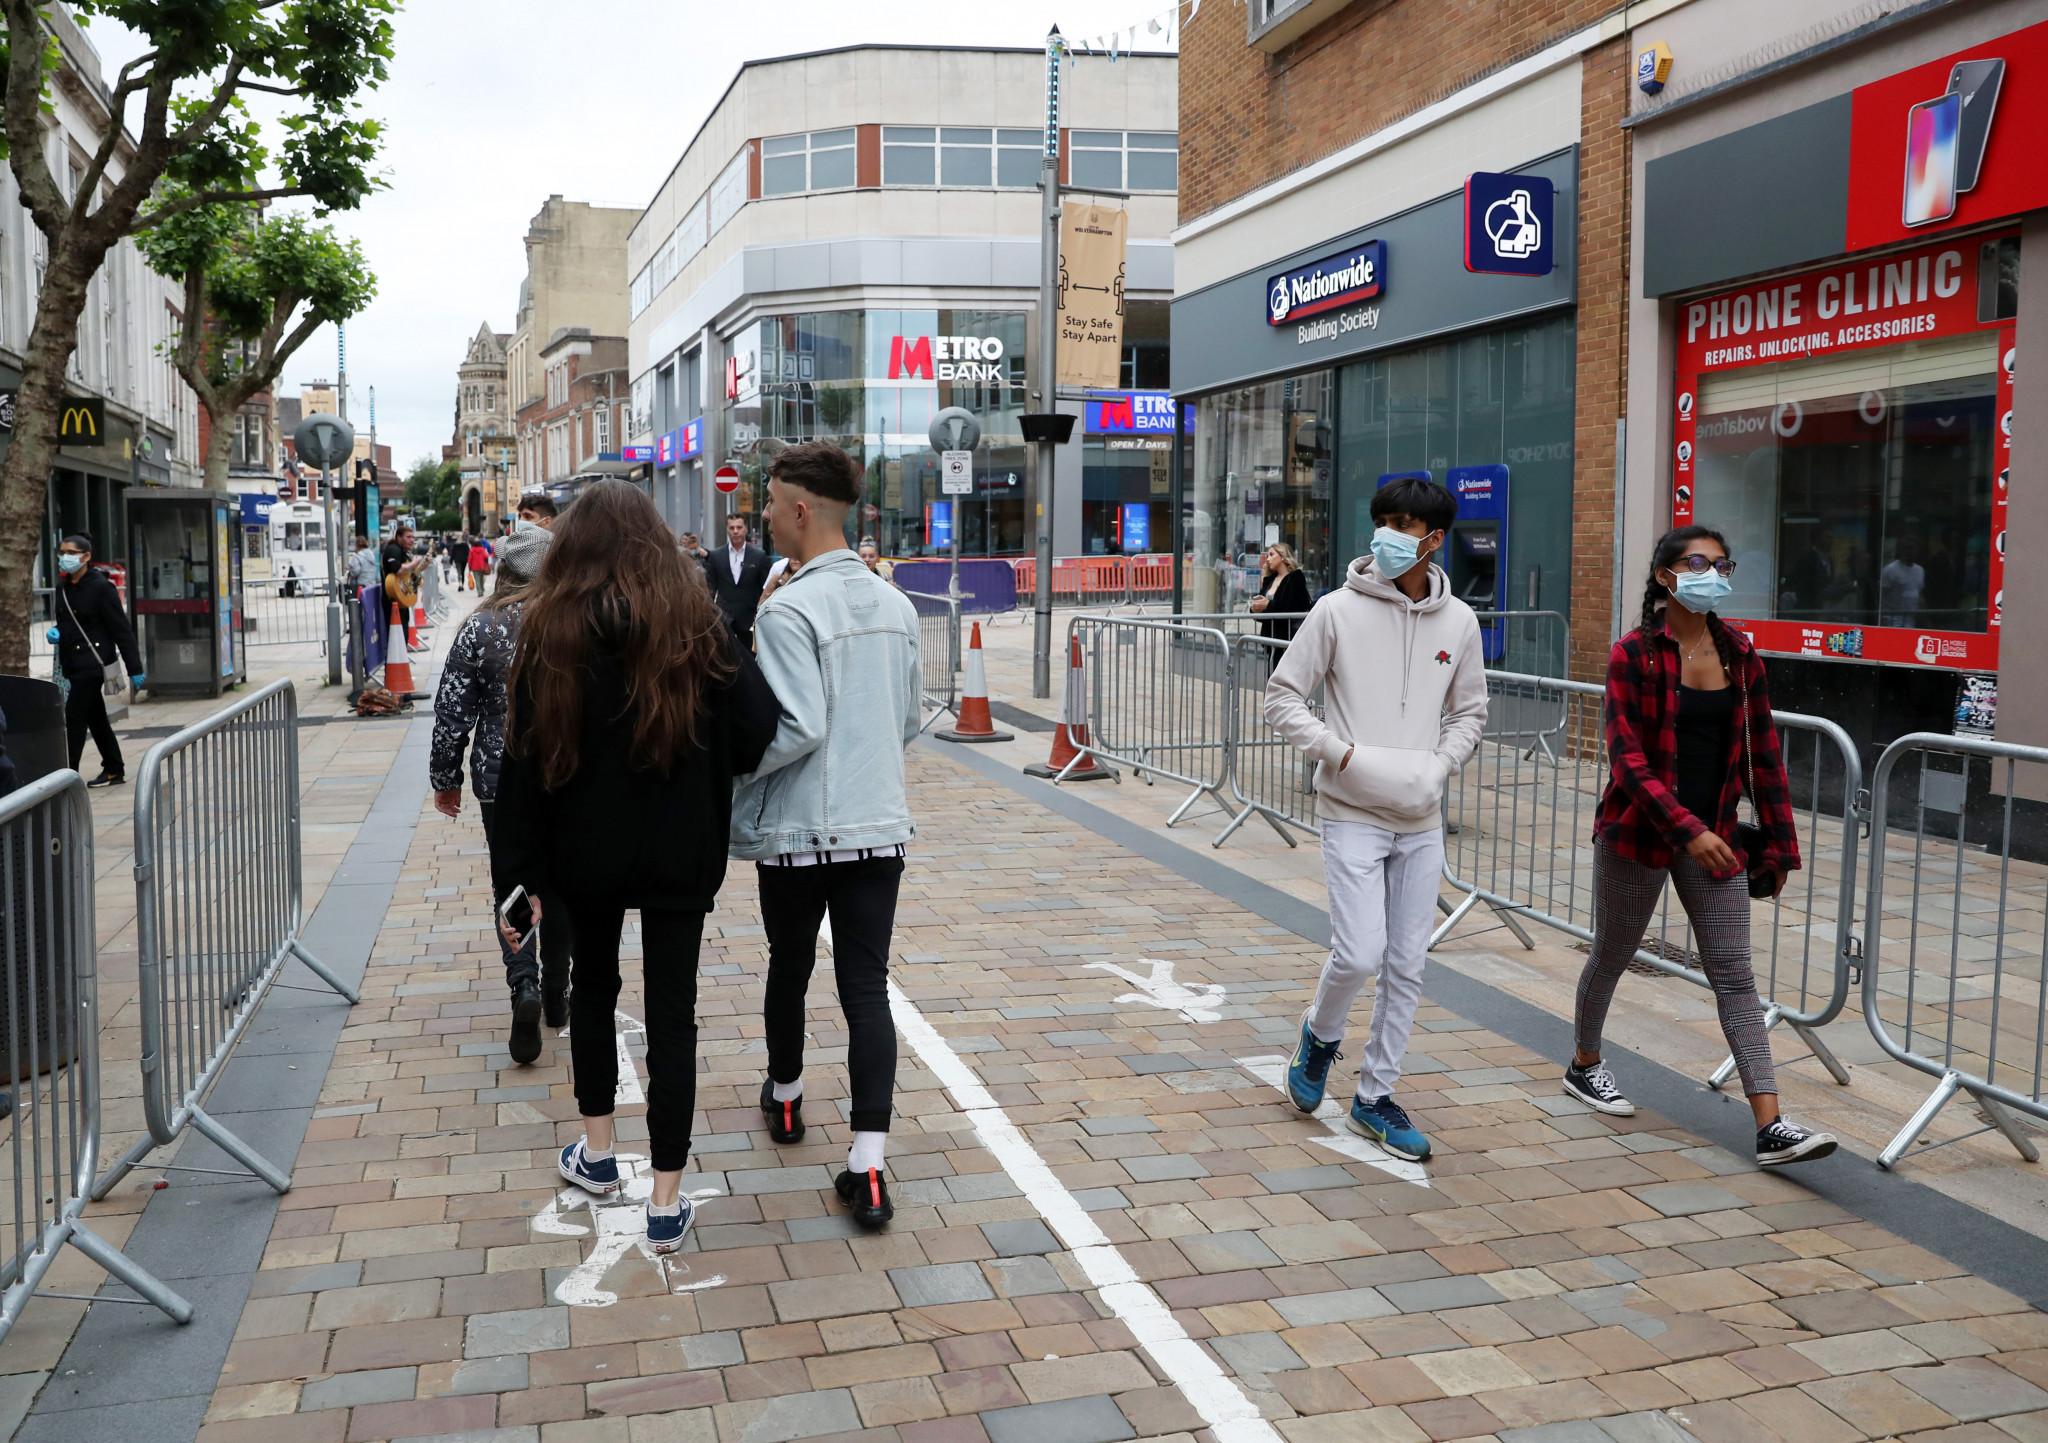 Cycling host Wolverhampton to start city centre renovations before Birmingham 2022